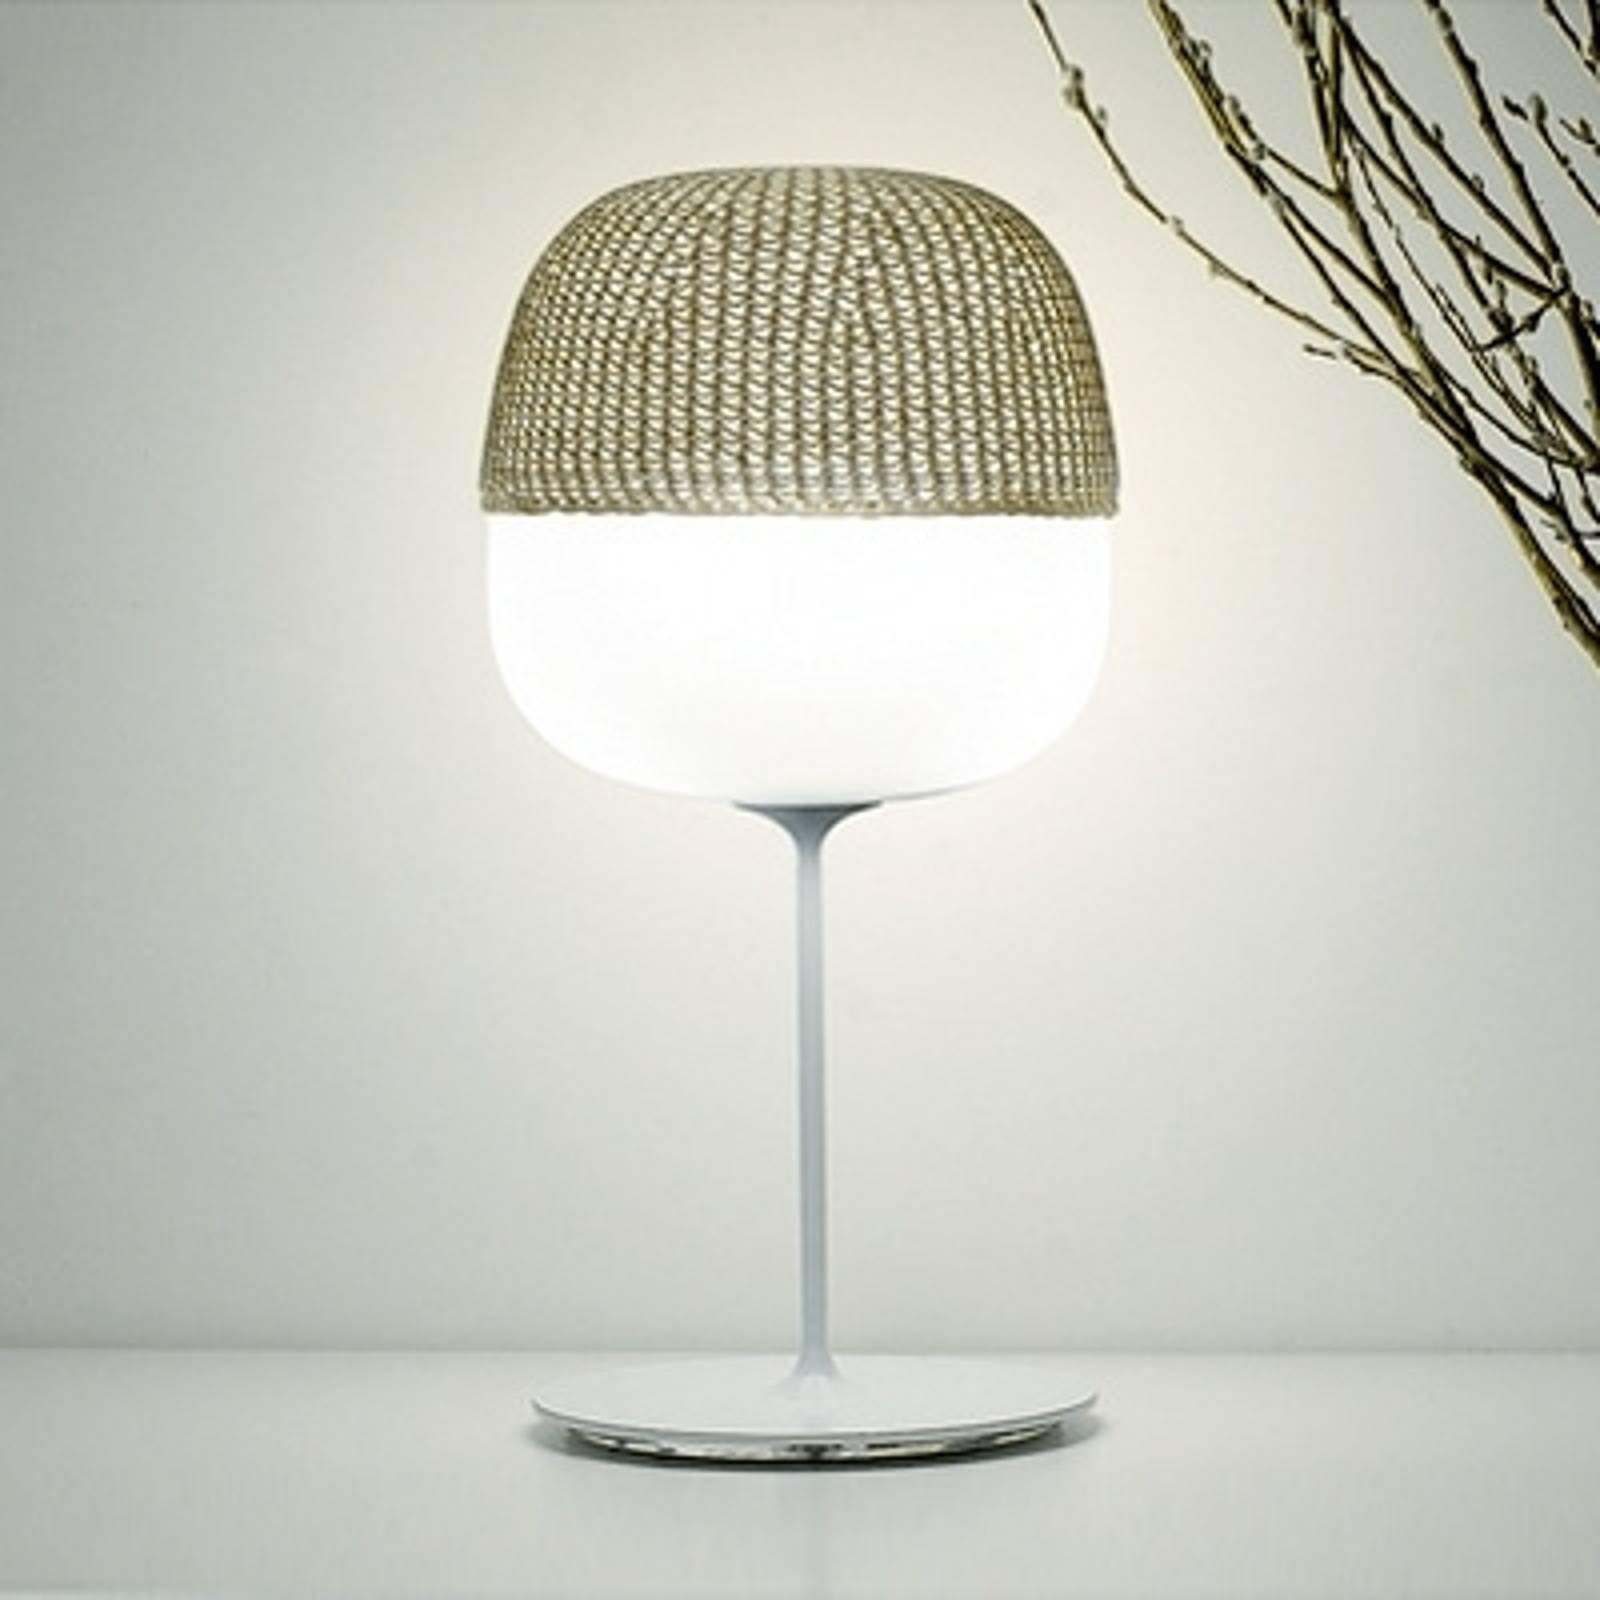 Afra - bordlampe med strølys, 63 cm